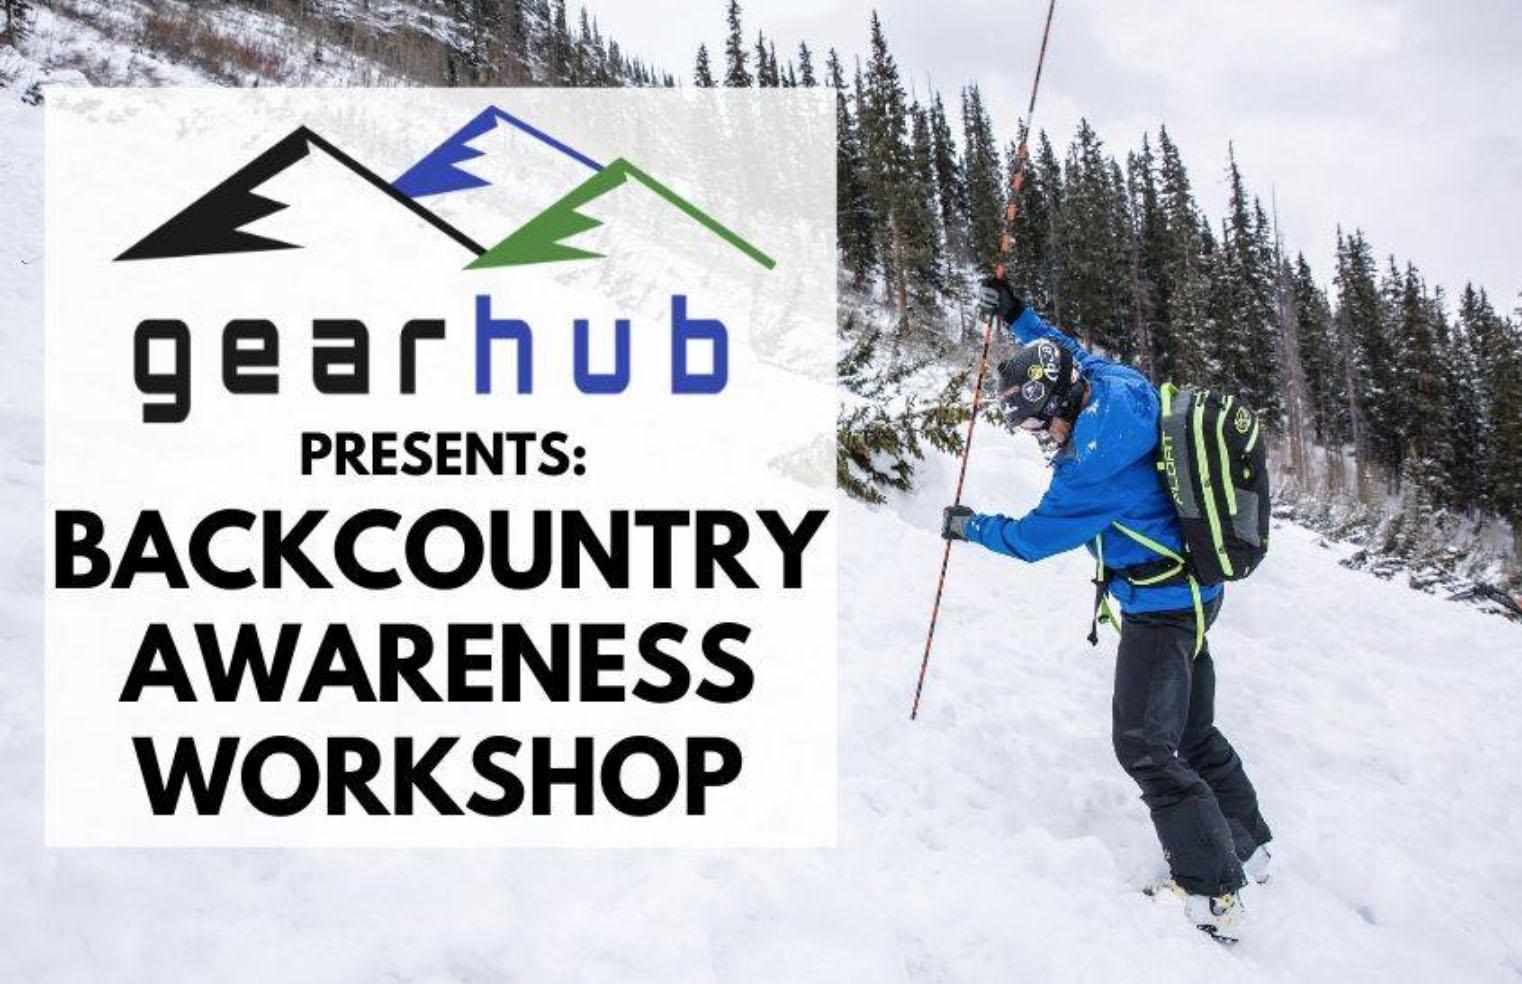 GearHub Backcountry Awareness